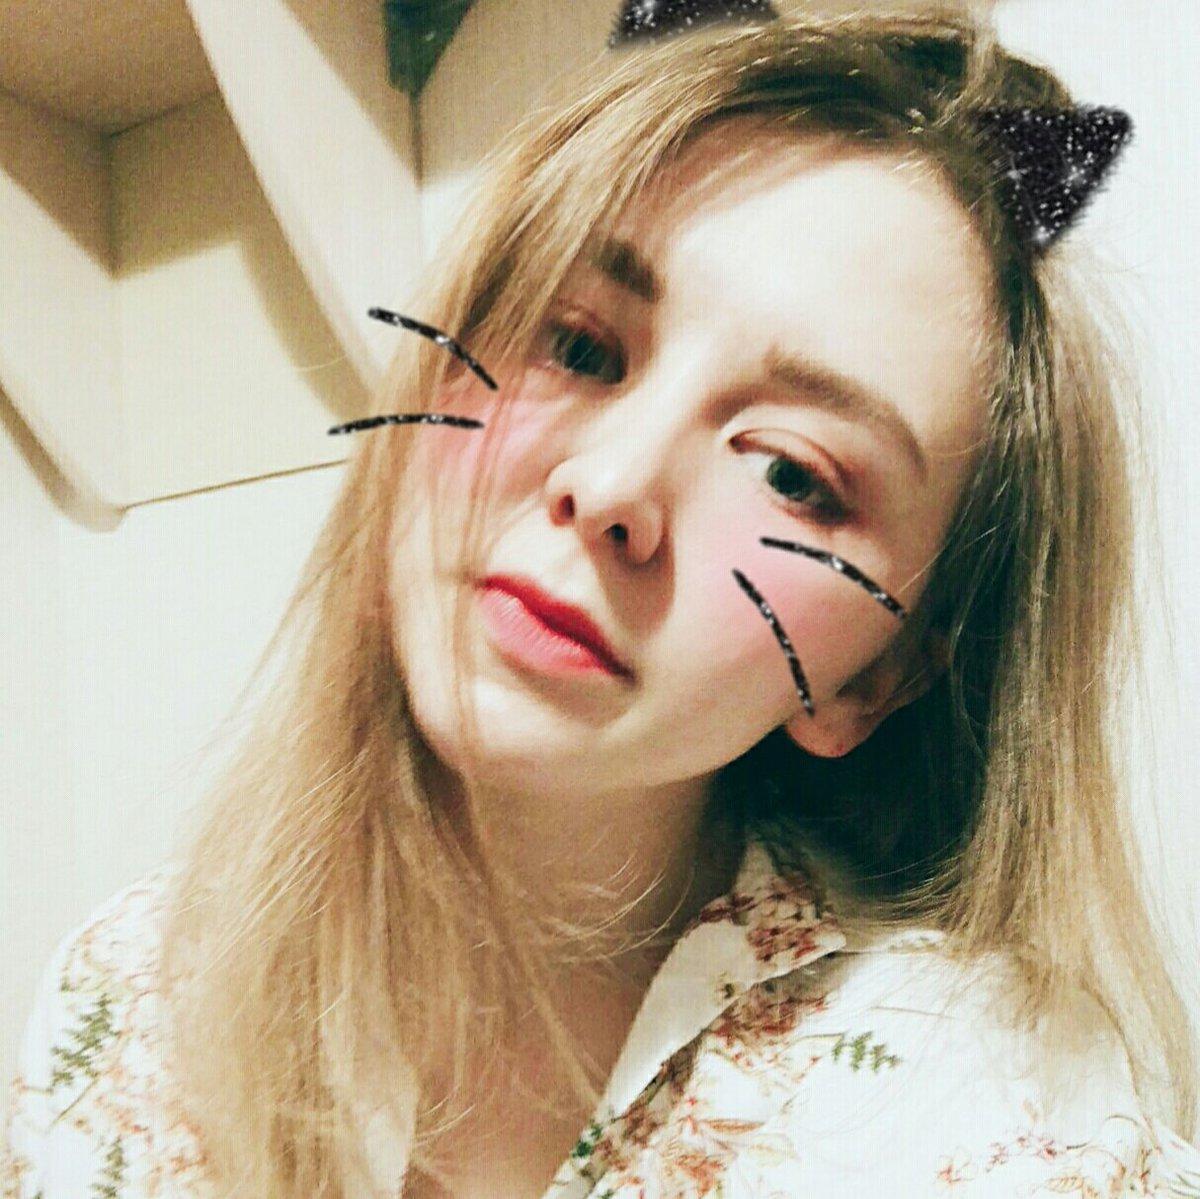 RT @butsaarik: [🚀]             You are my galaxy 🌌        🌠   💫  [#NCTzenSelcaDay ] https://t.co/uzxD3Bf3qL